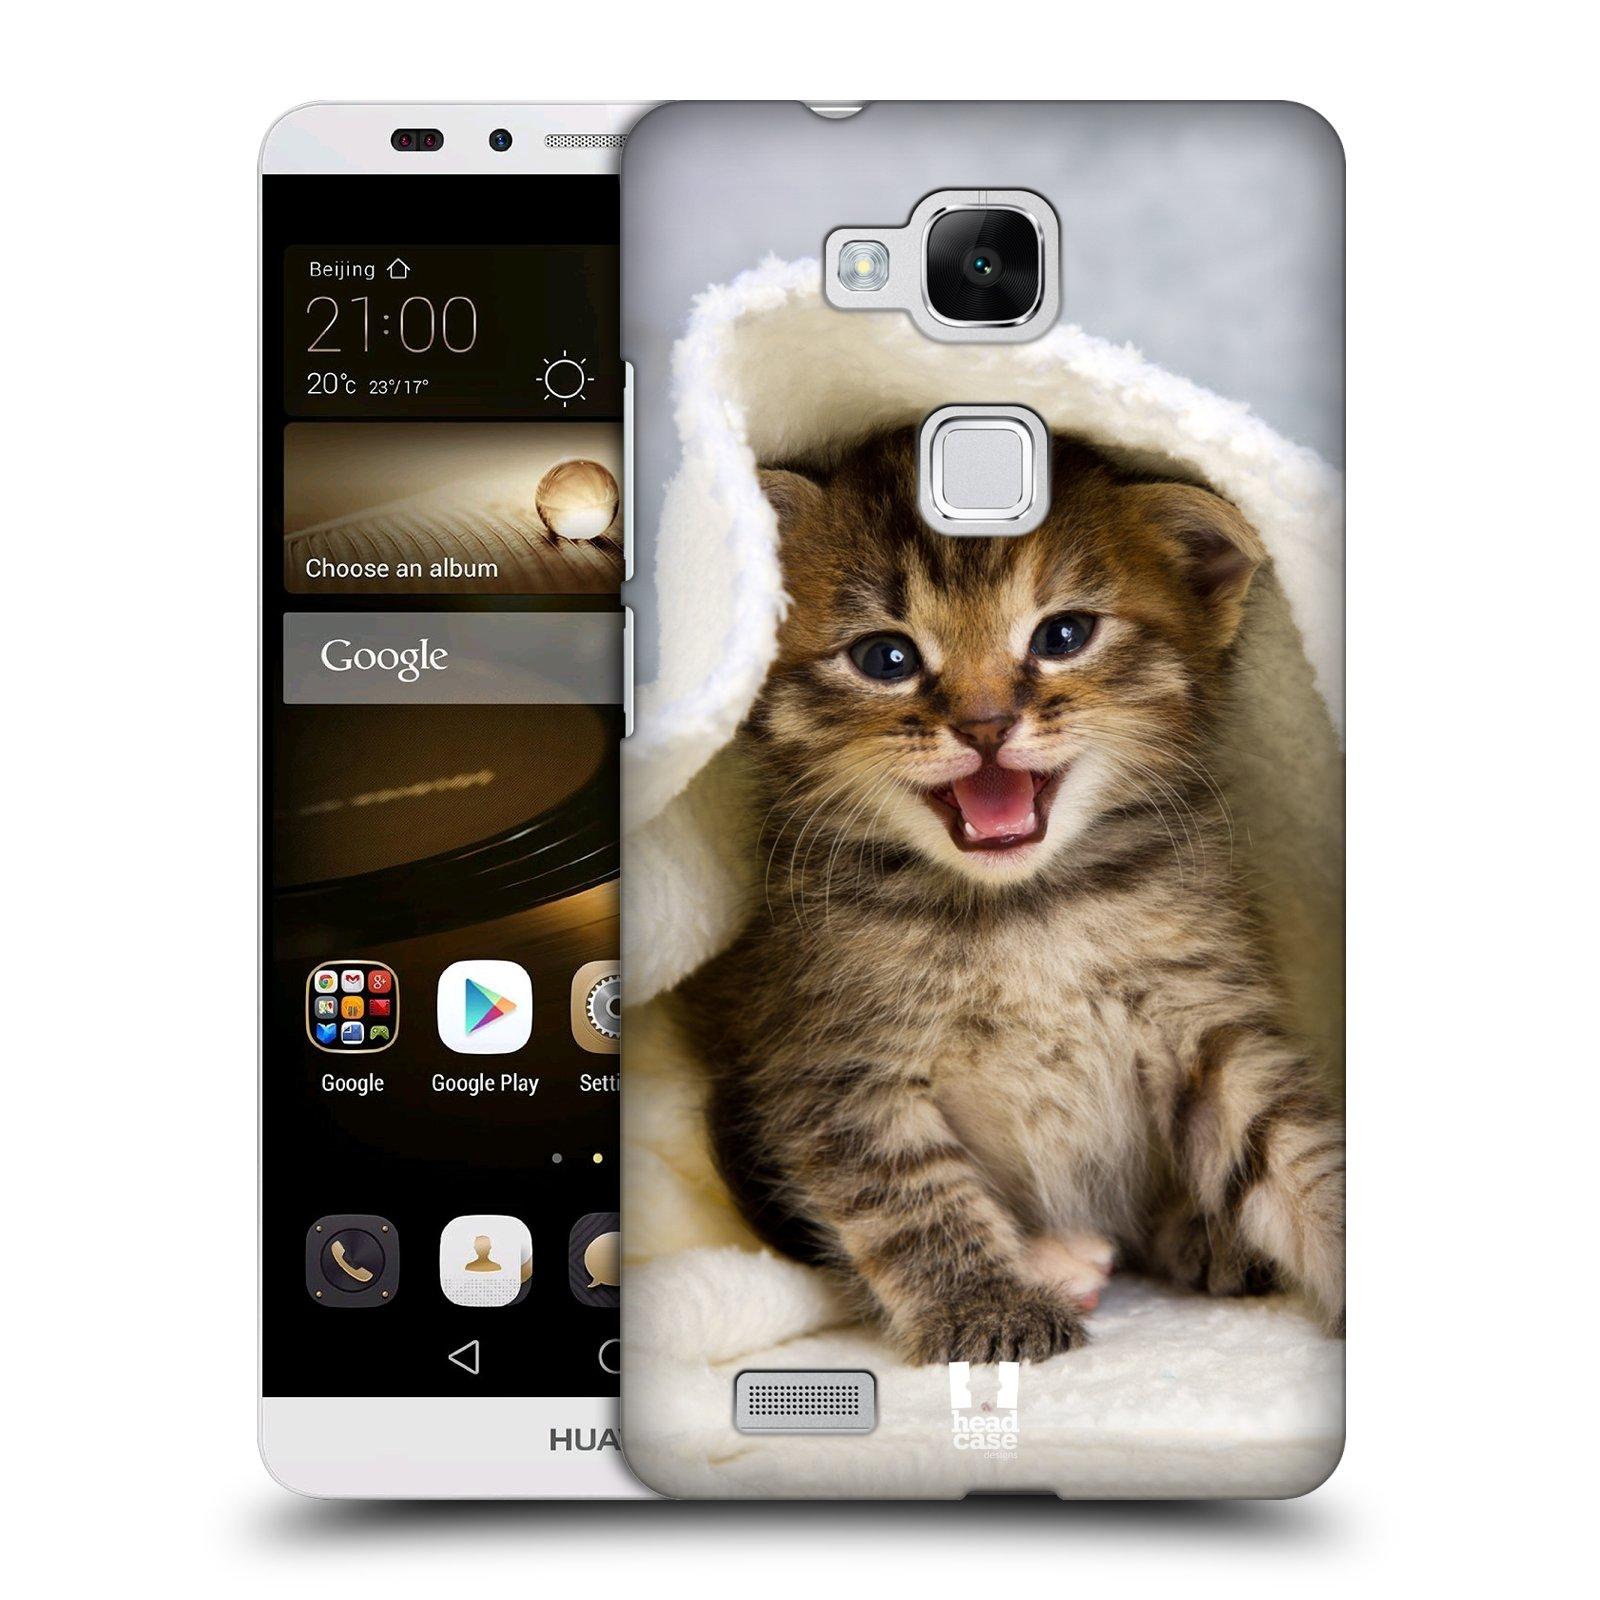 HEAD CASE plastový obal na mobil Huawei Mate 7 vzor Kočičky koťata foto kotě v ručníku